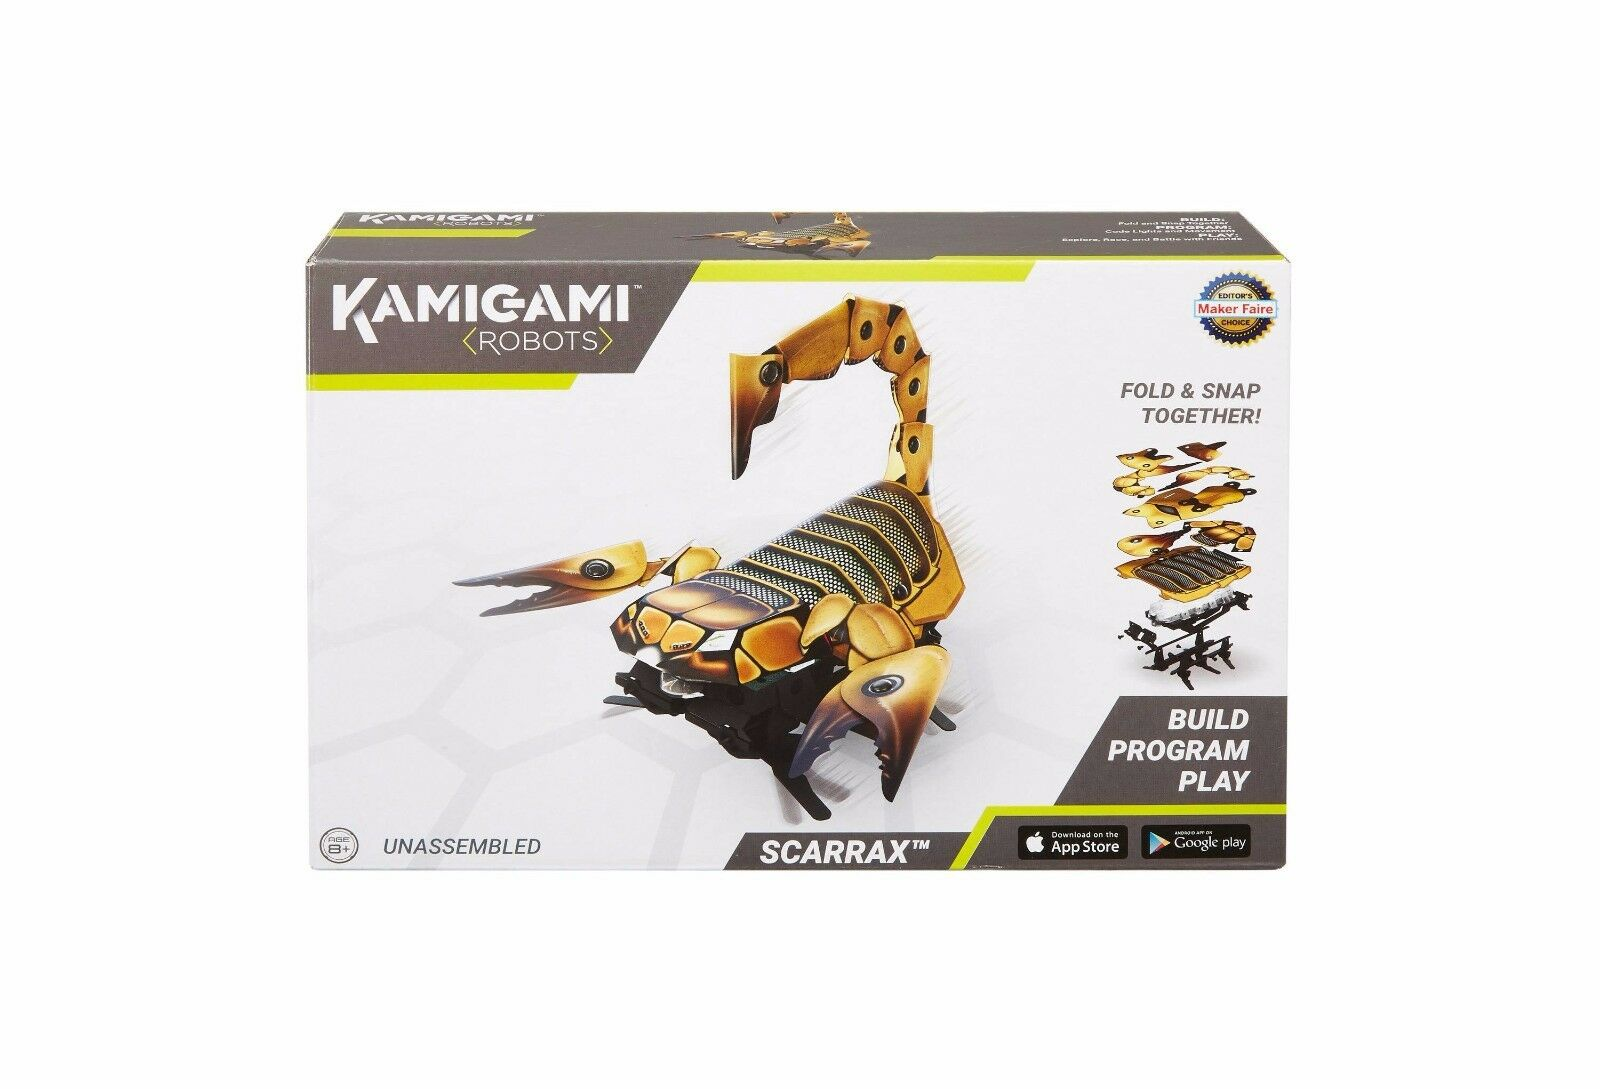 Kamigami Robots monter votre propre Robot